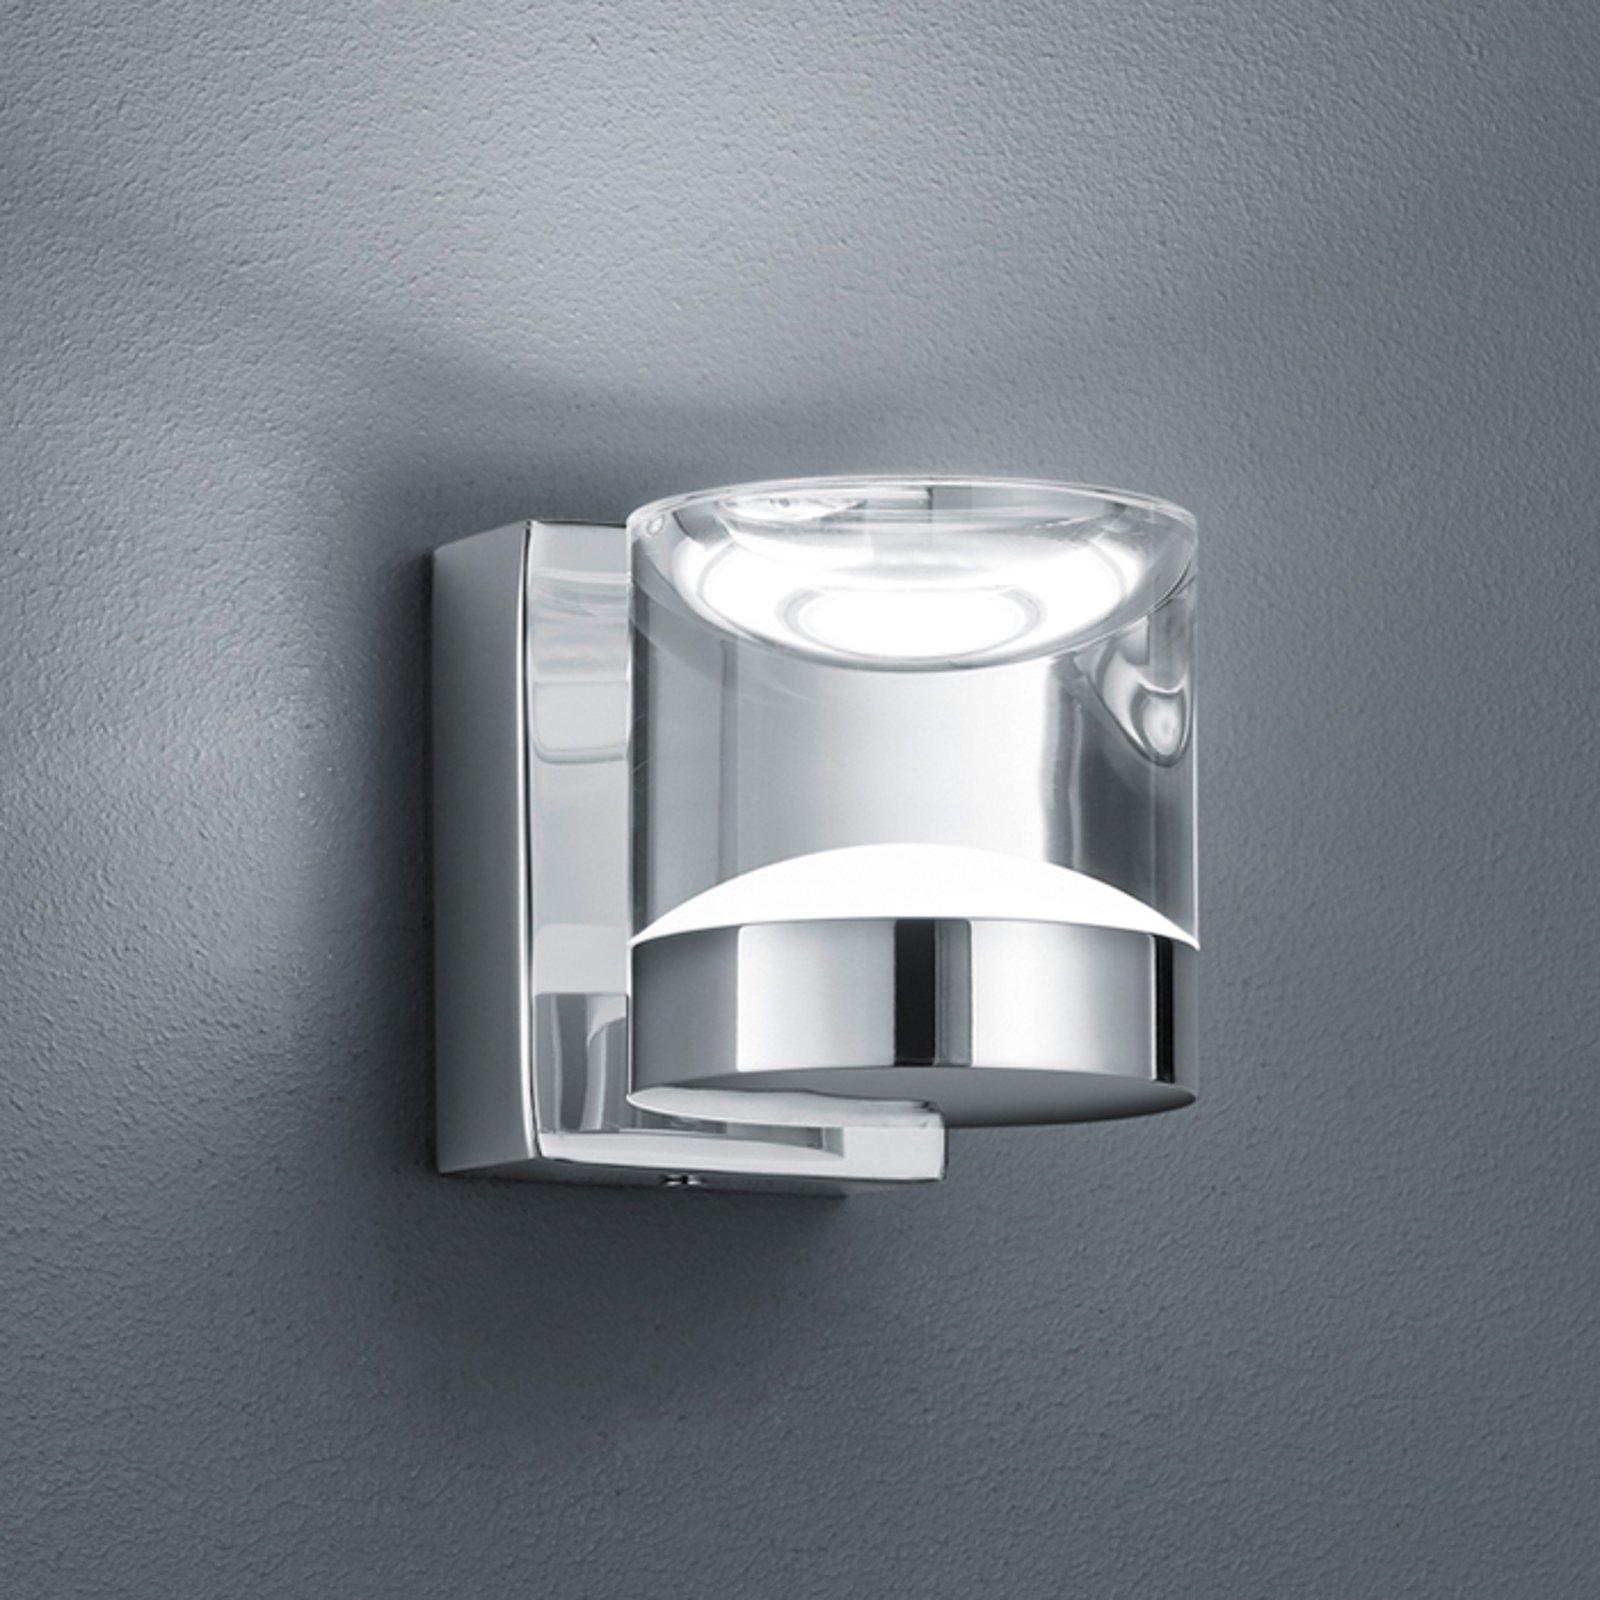 Blank forkrommet LED vegglampe til bad Brian